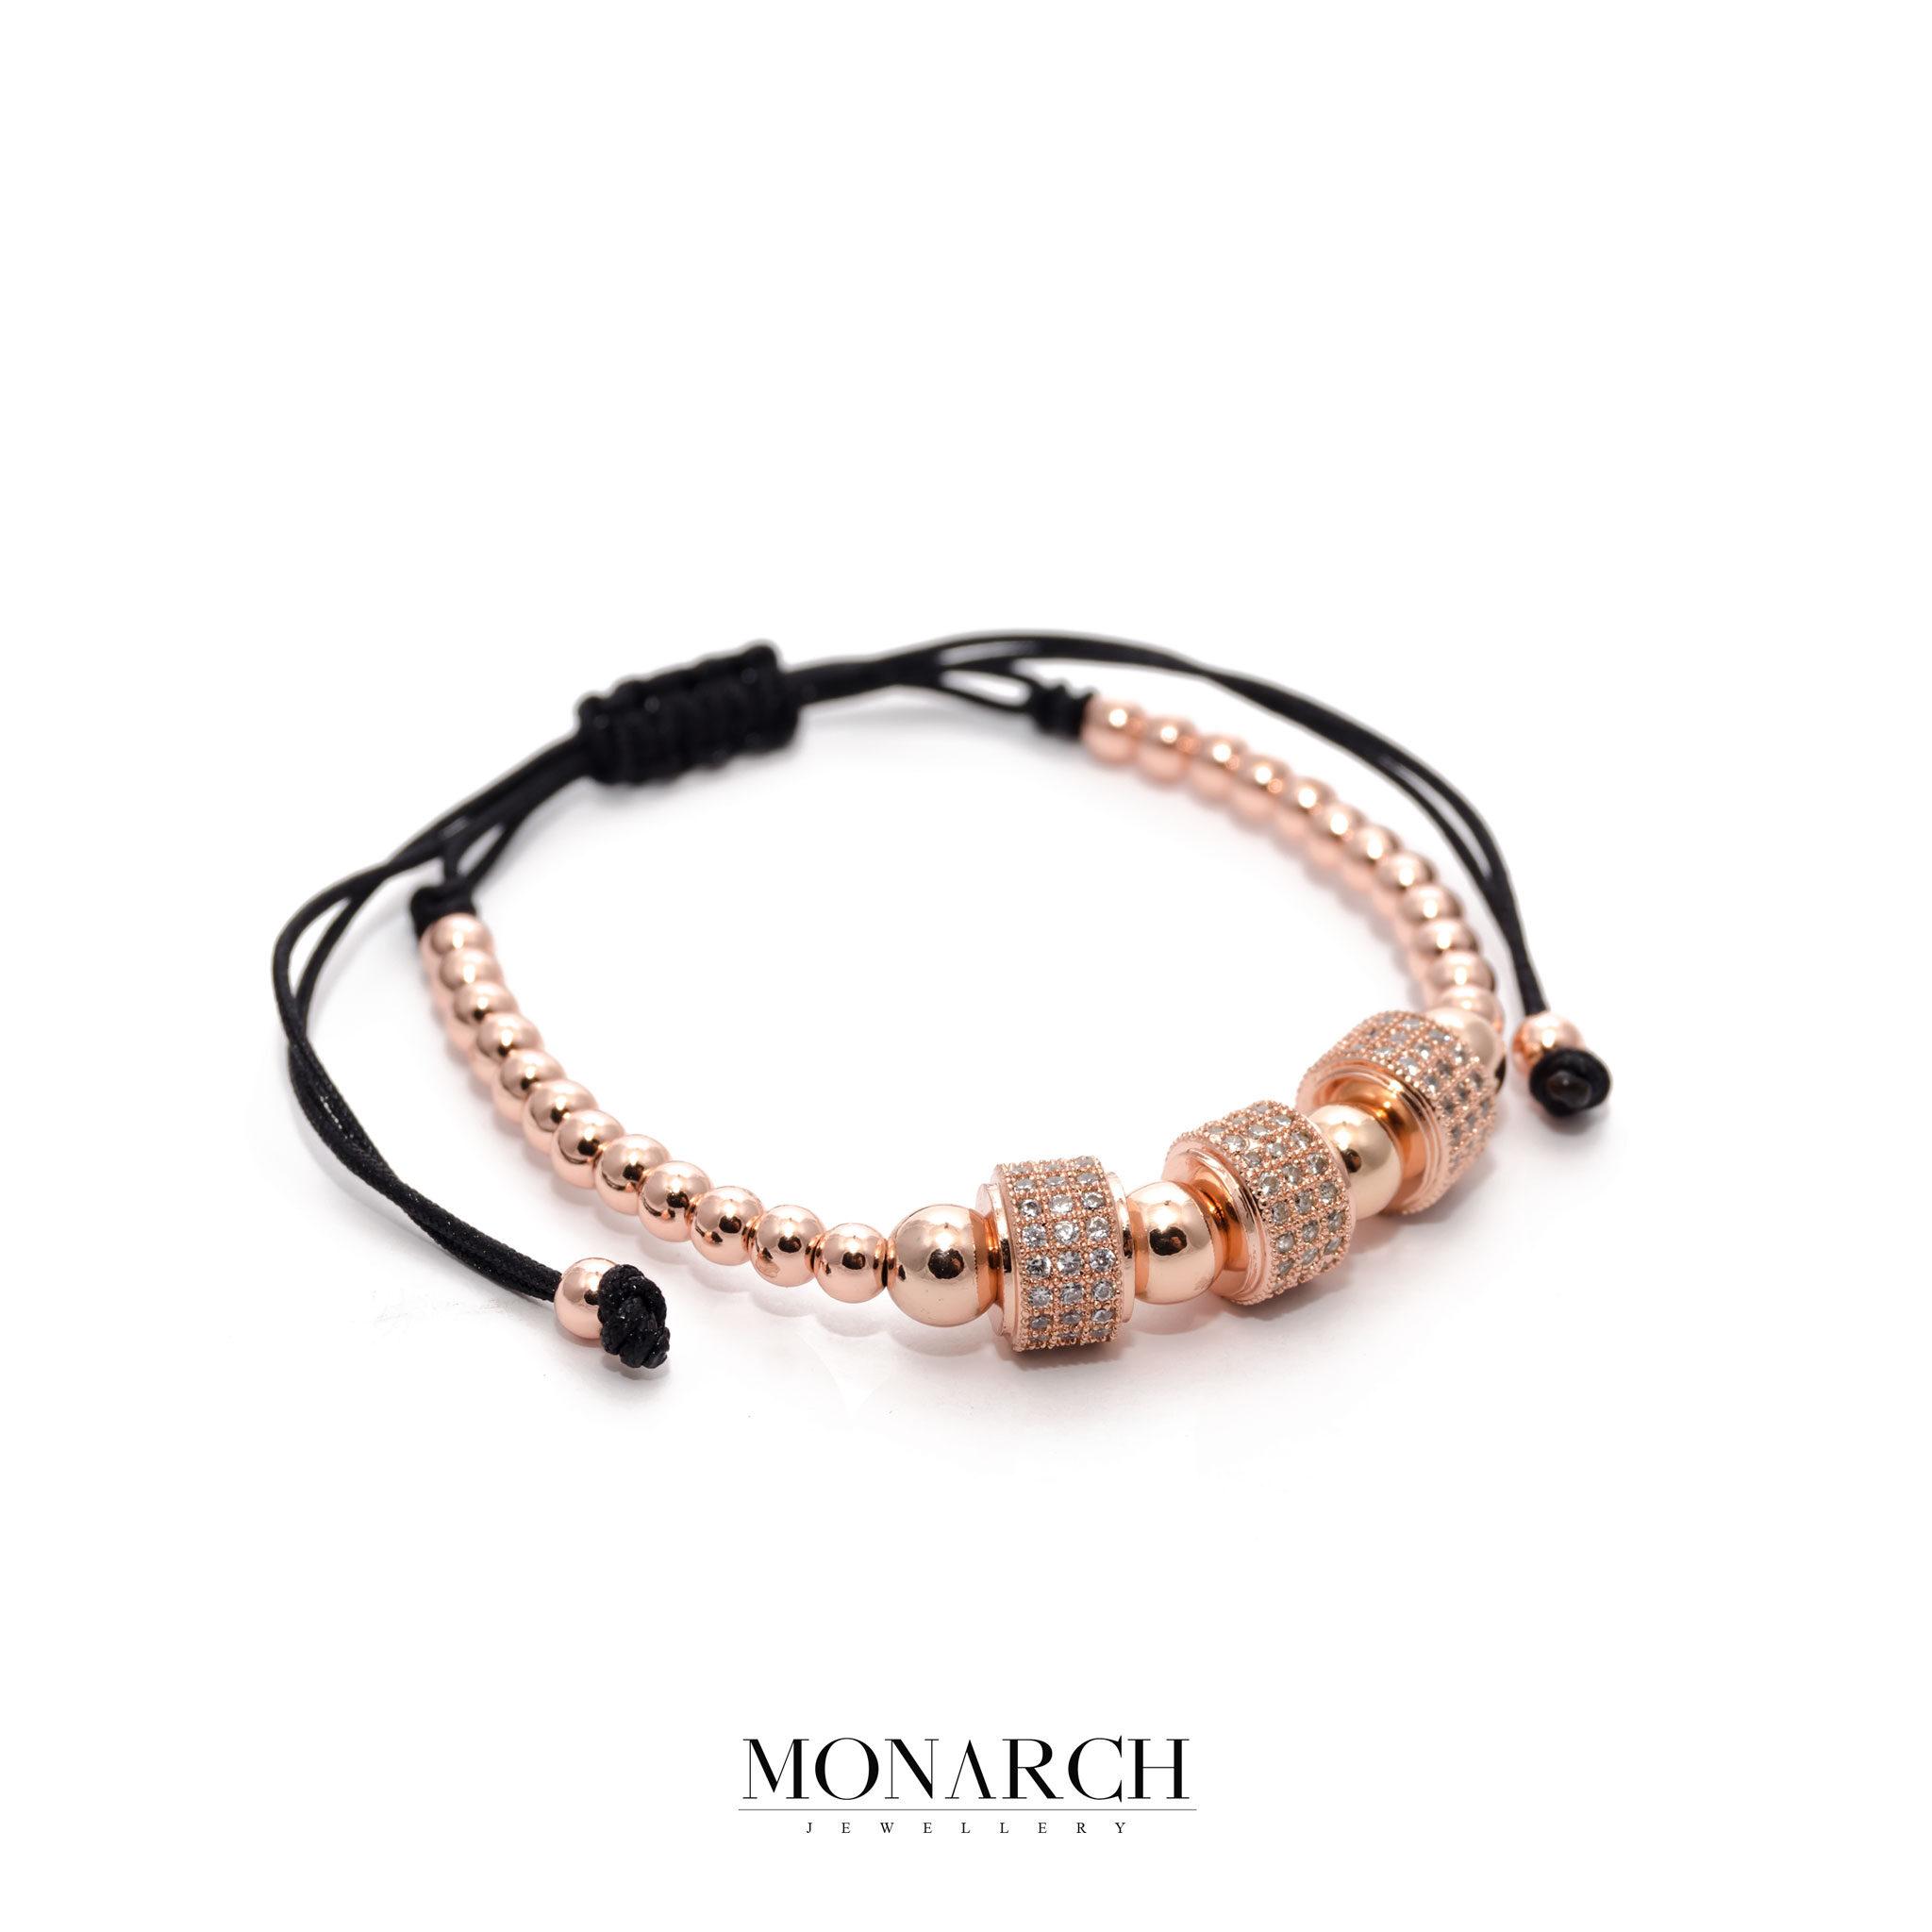 24K Rose Gold Trio Circum Macrame Bracelet